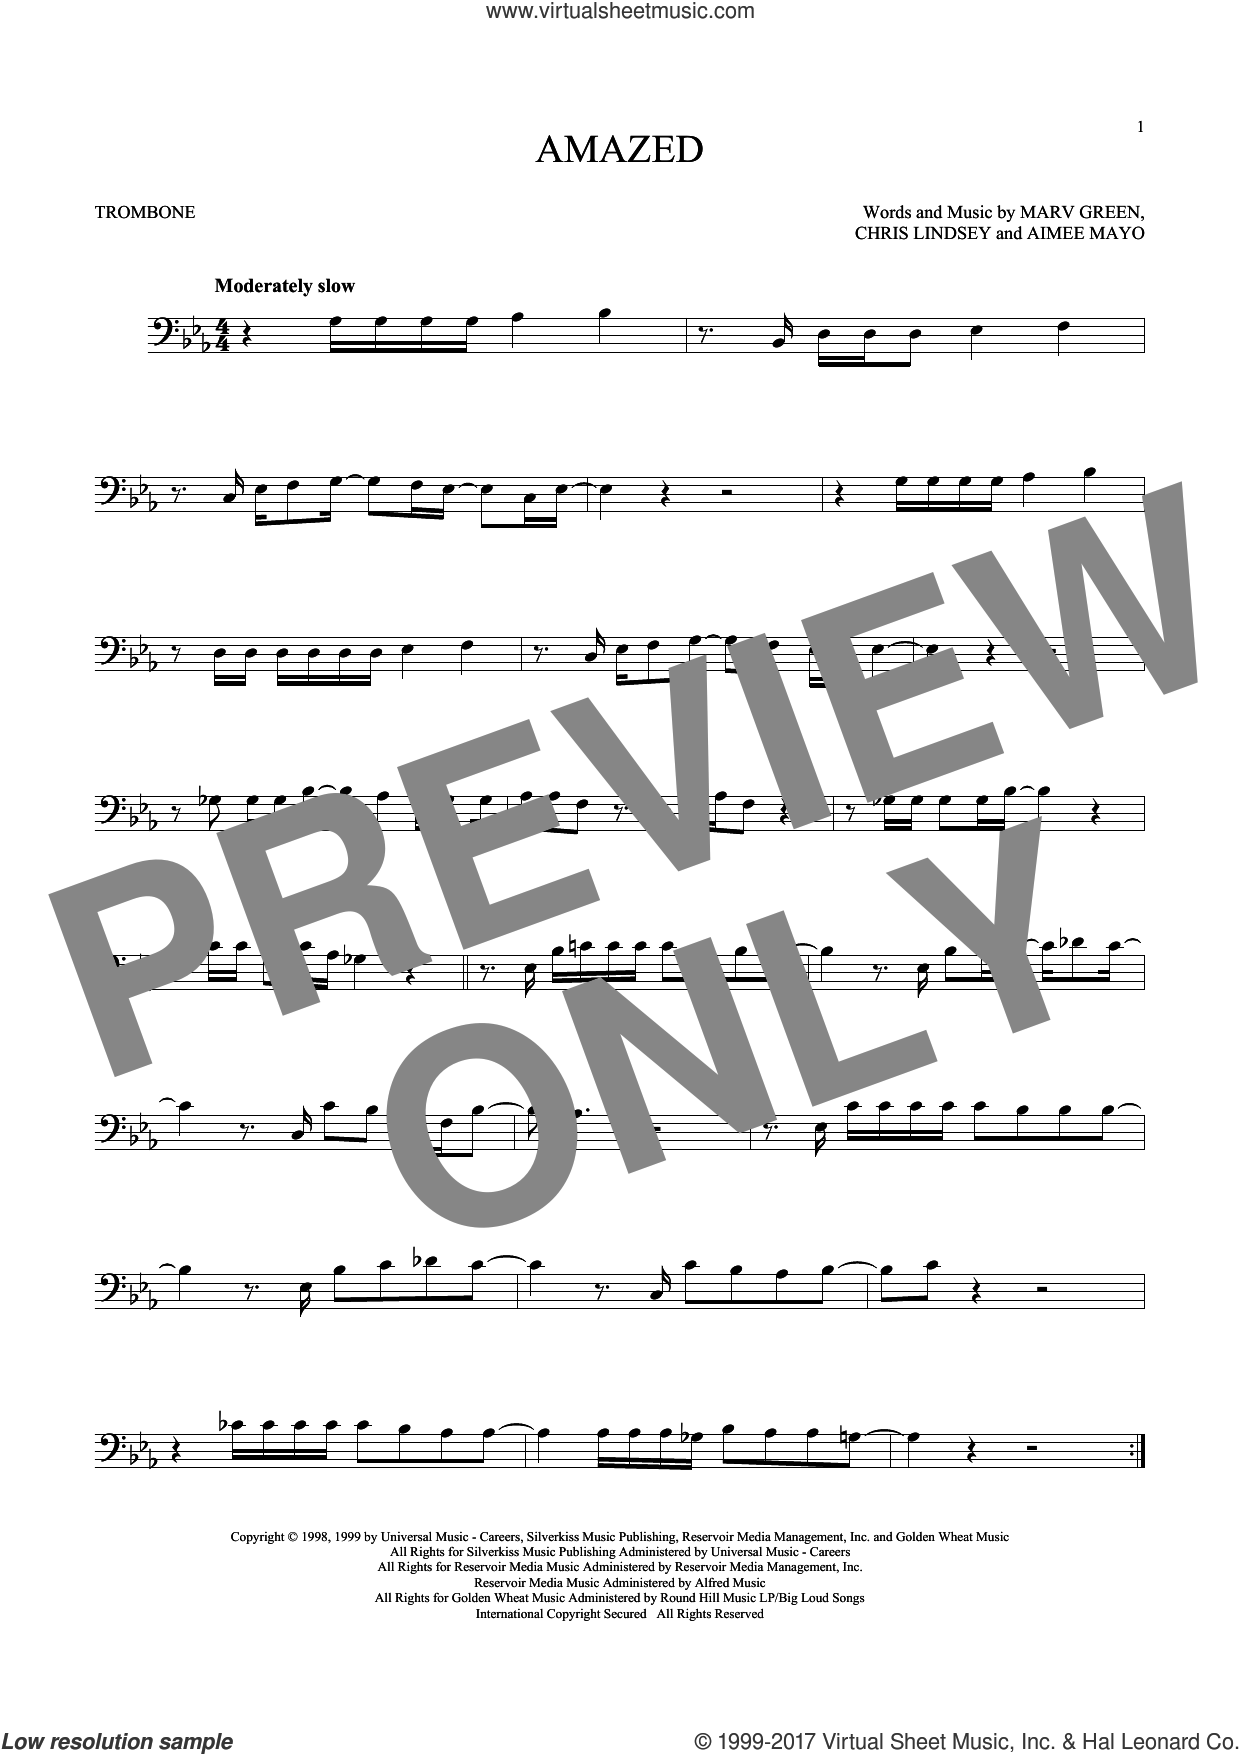 Amazed sheet music for trombone solo by Lonestar, Aimee Mayo, Chris Lindsey and Marv Green, wedding score, intermediate skill level